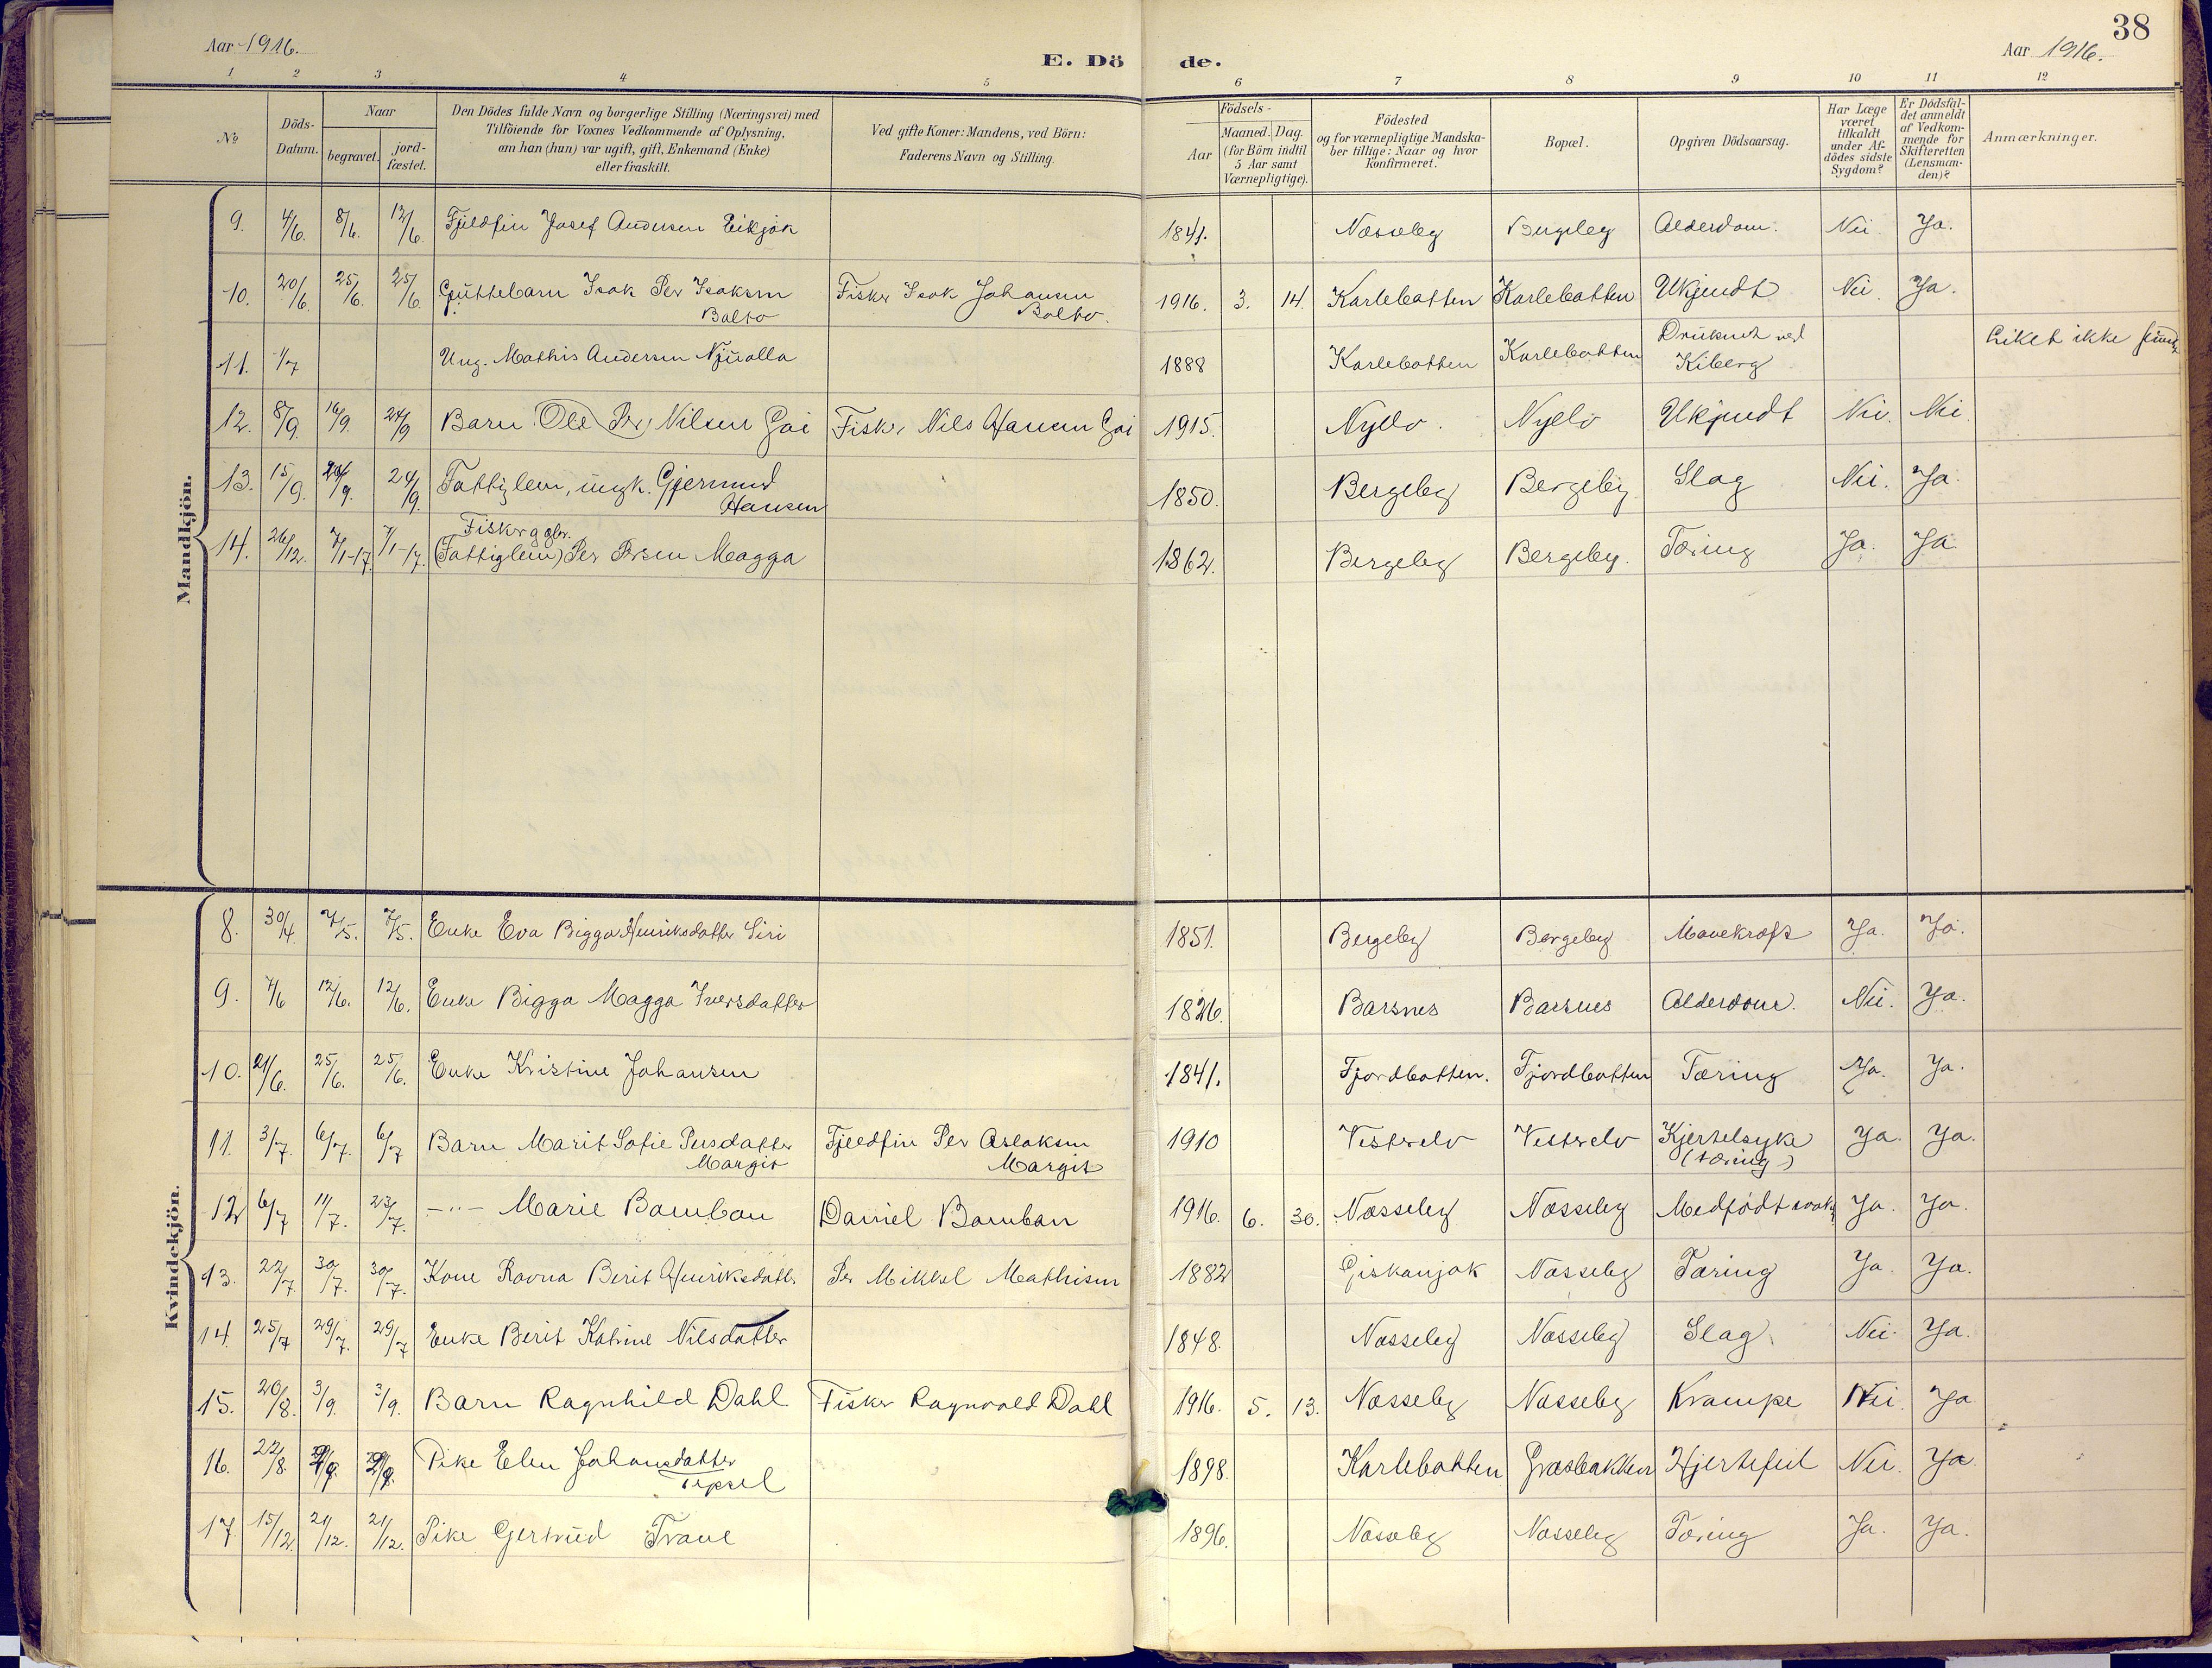 SATØ, Nesseby sokneprestkontor, H/Ha/L0007kirke: Ministerialbok nr. 7, 1898-1921, s. 38